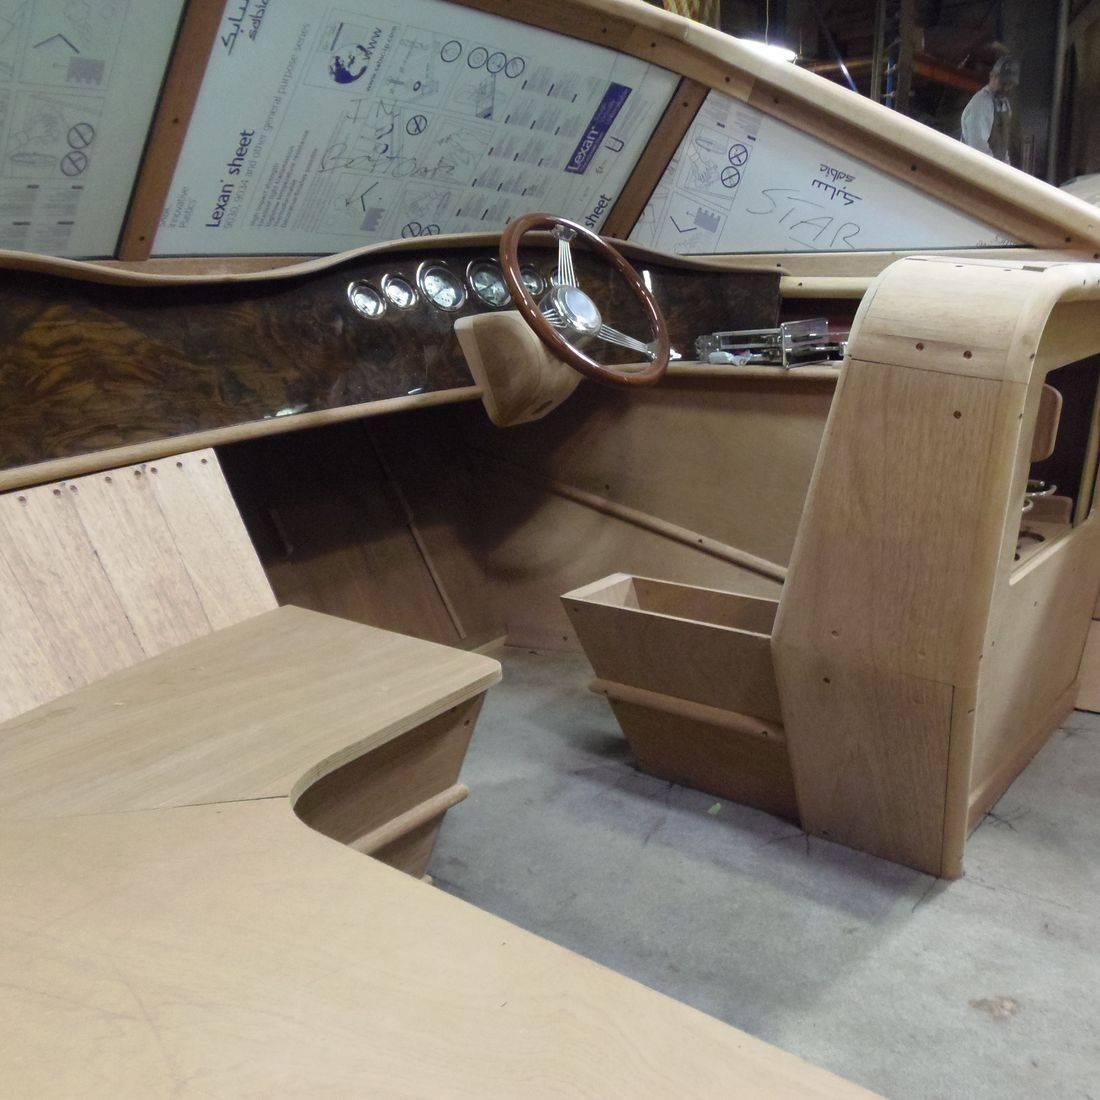 Streblow boat